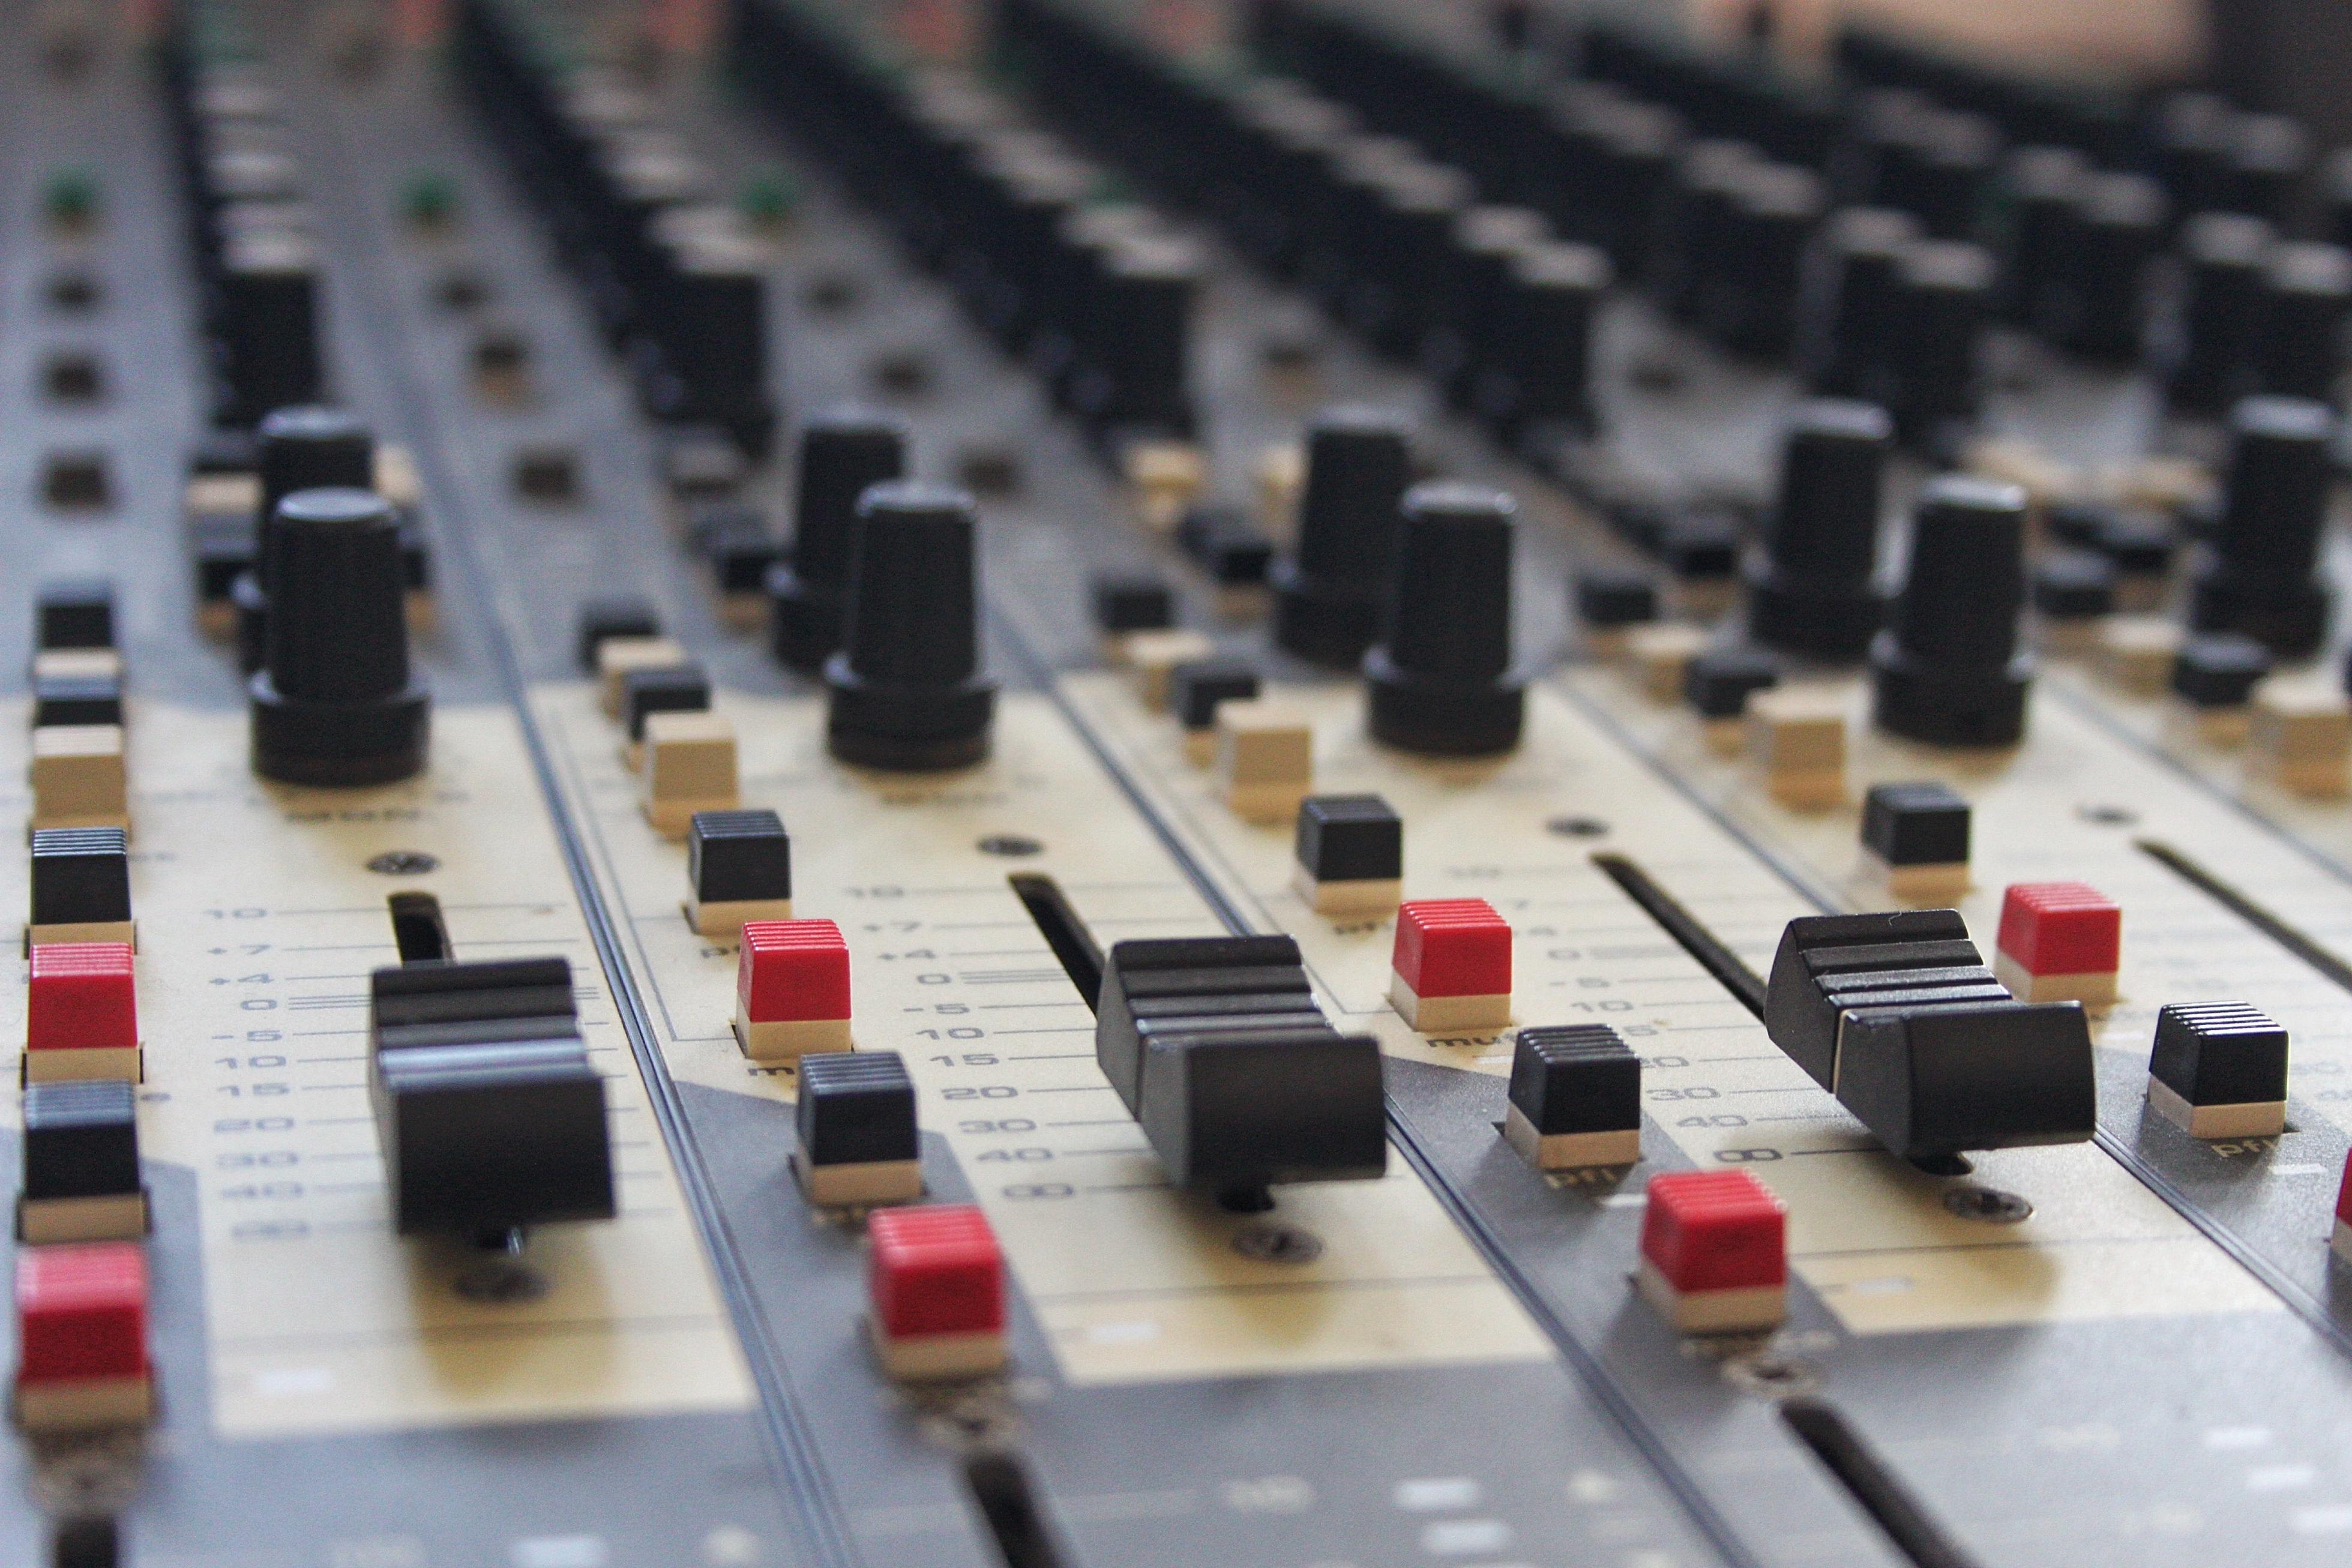 Desk Music Vintage Equipment Recording Studio Professional Toy Mixing Audio Mixer Sound Mix